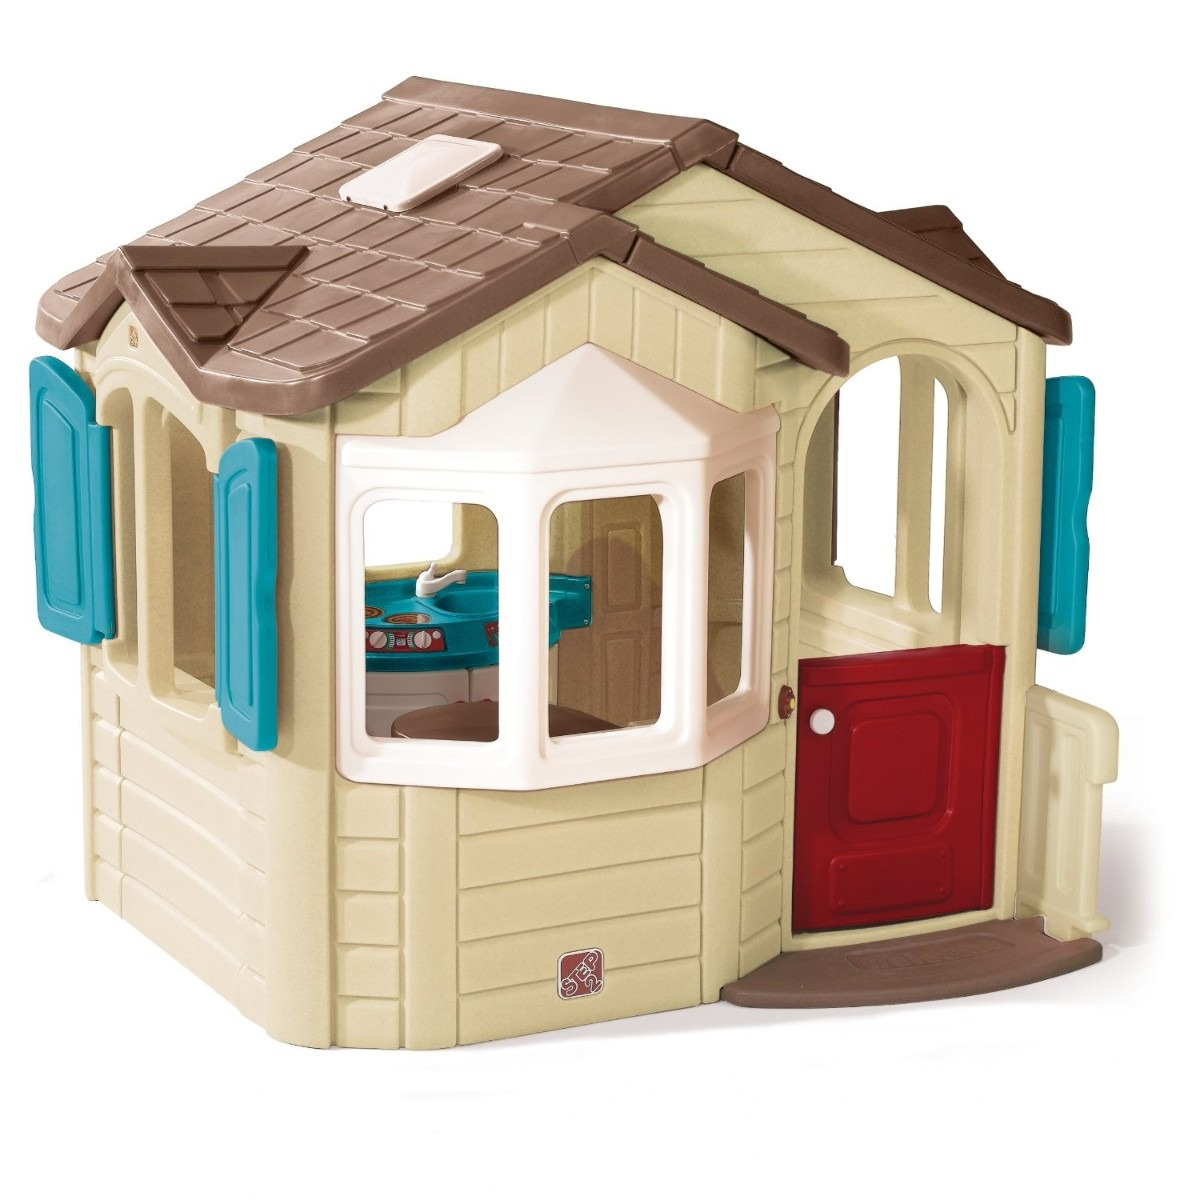 Casa casita infantil juegos ni os playhouse step2 pm0 for Casitas ninos ofertas